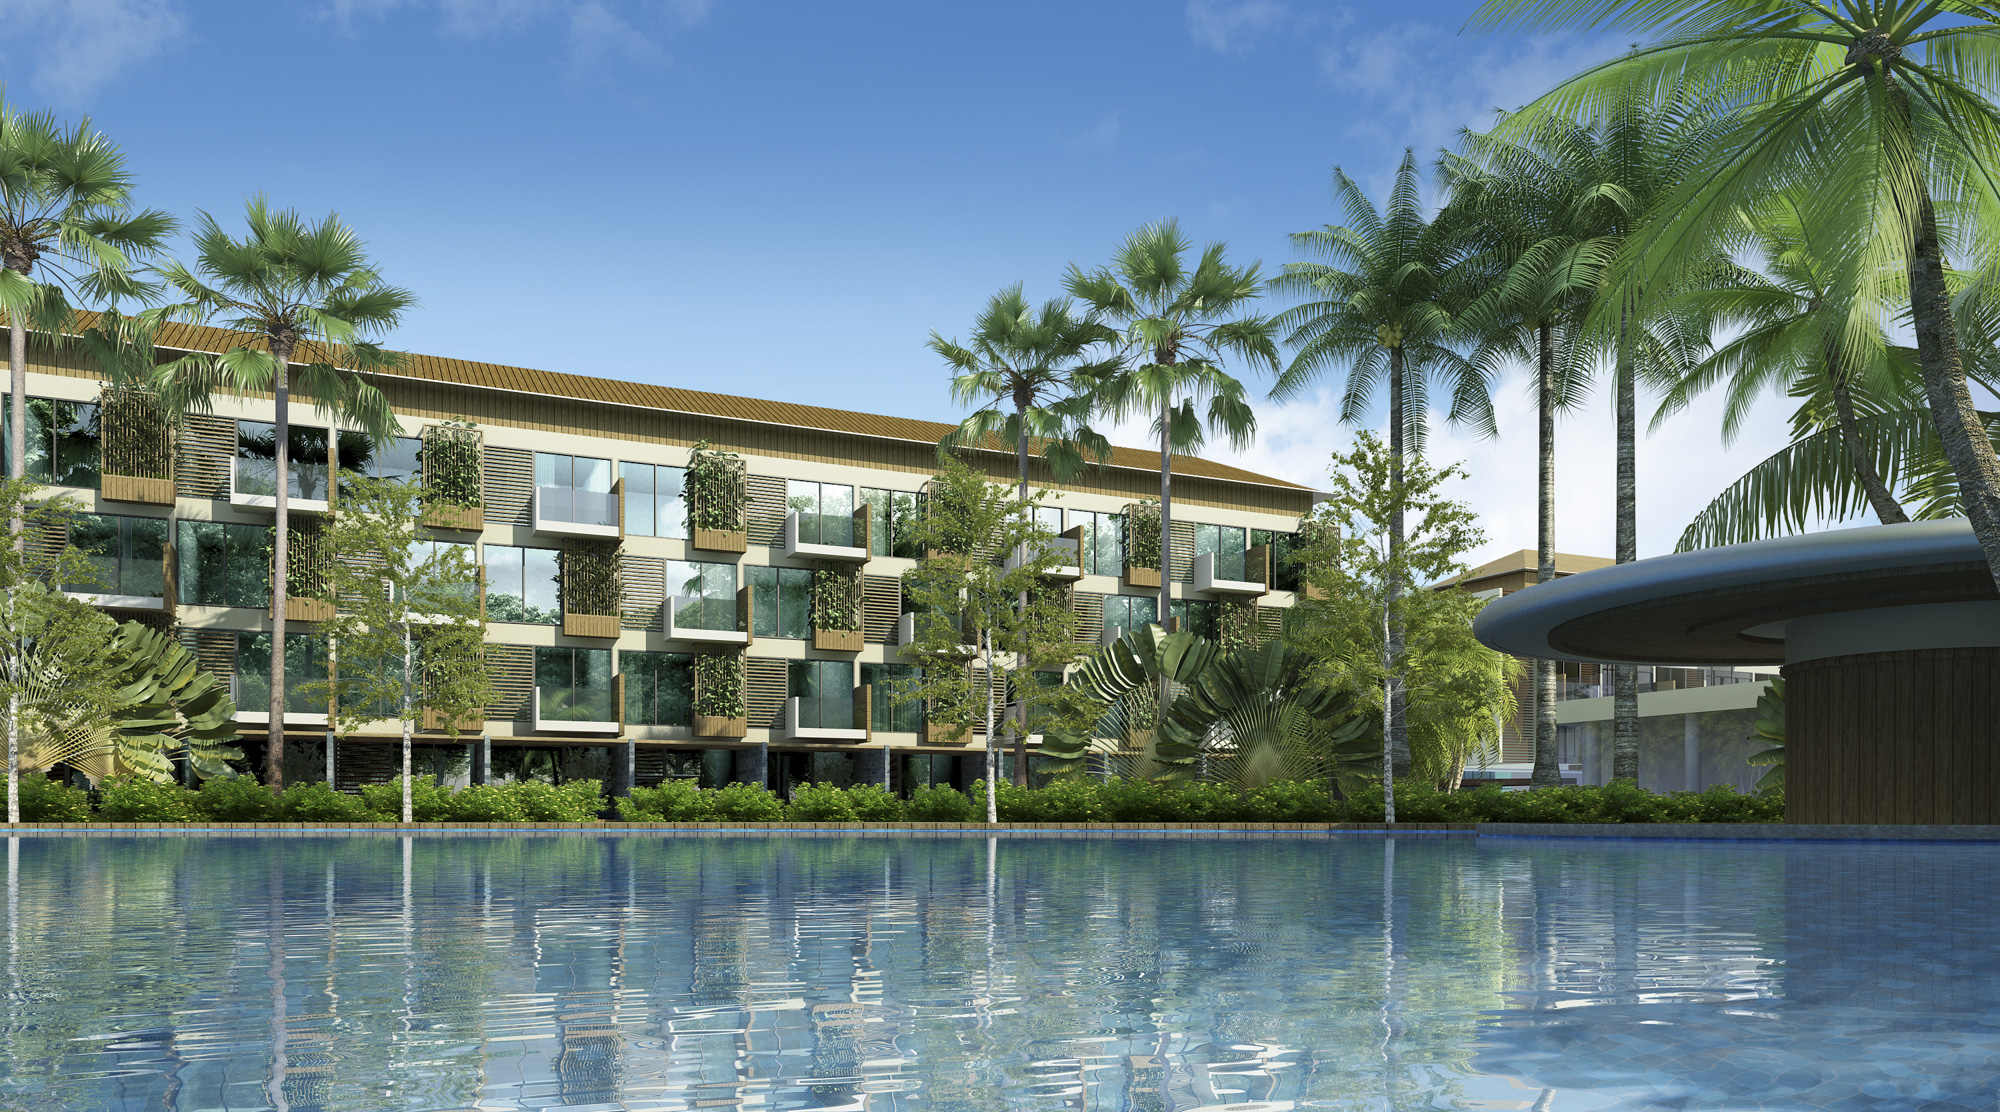 Song Hau Resort Exterior 3